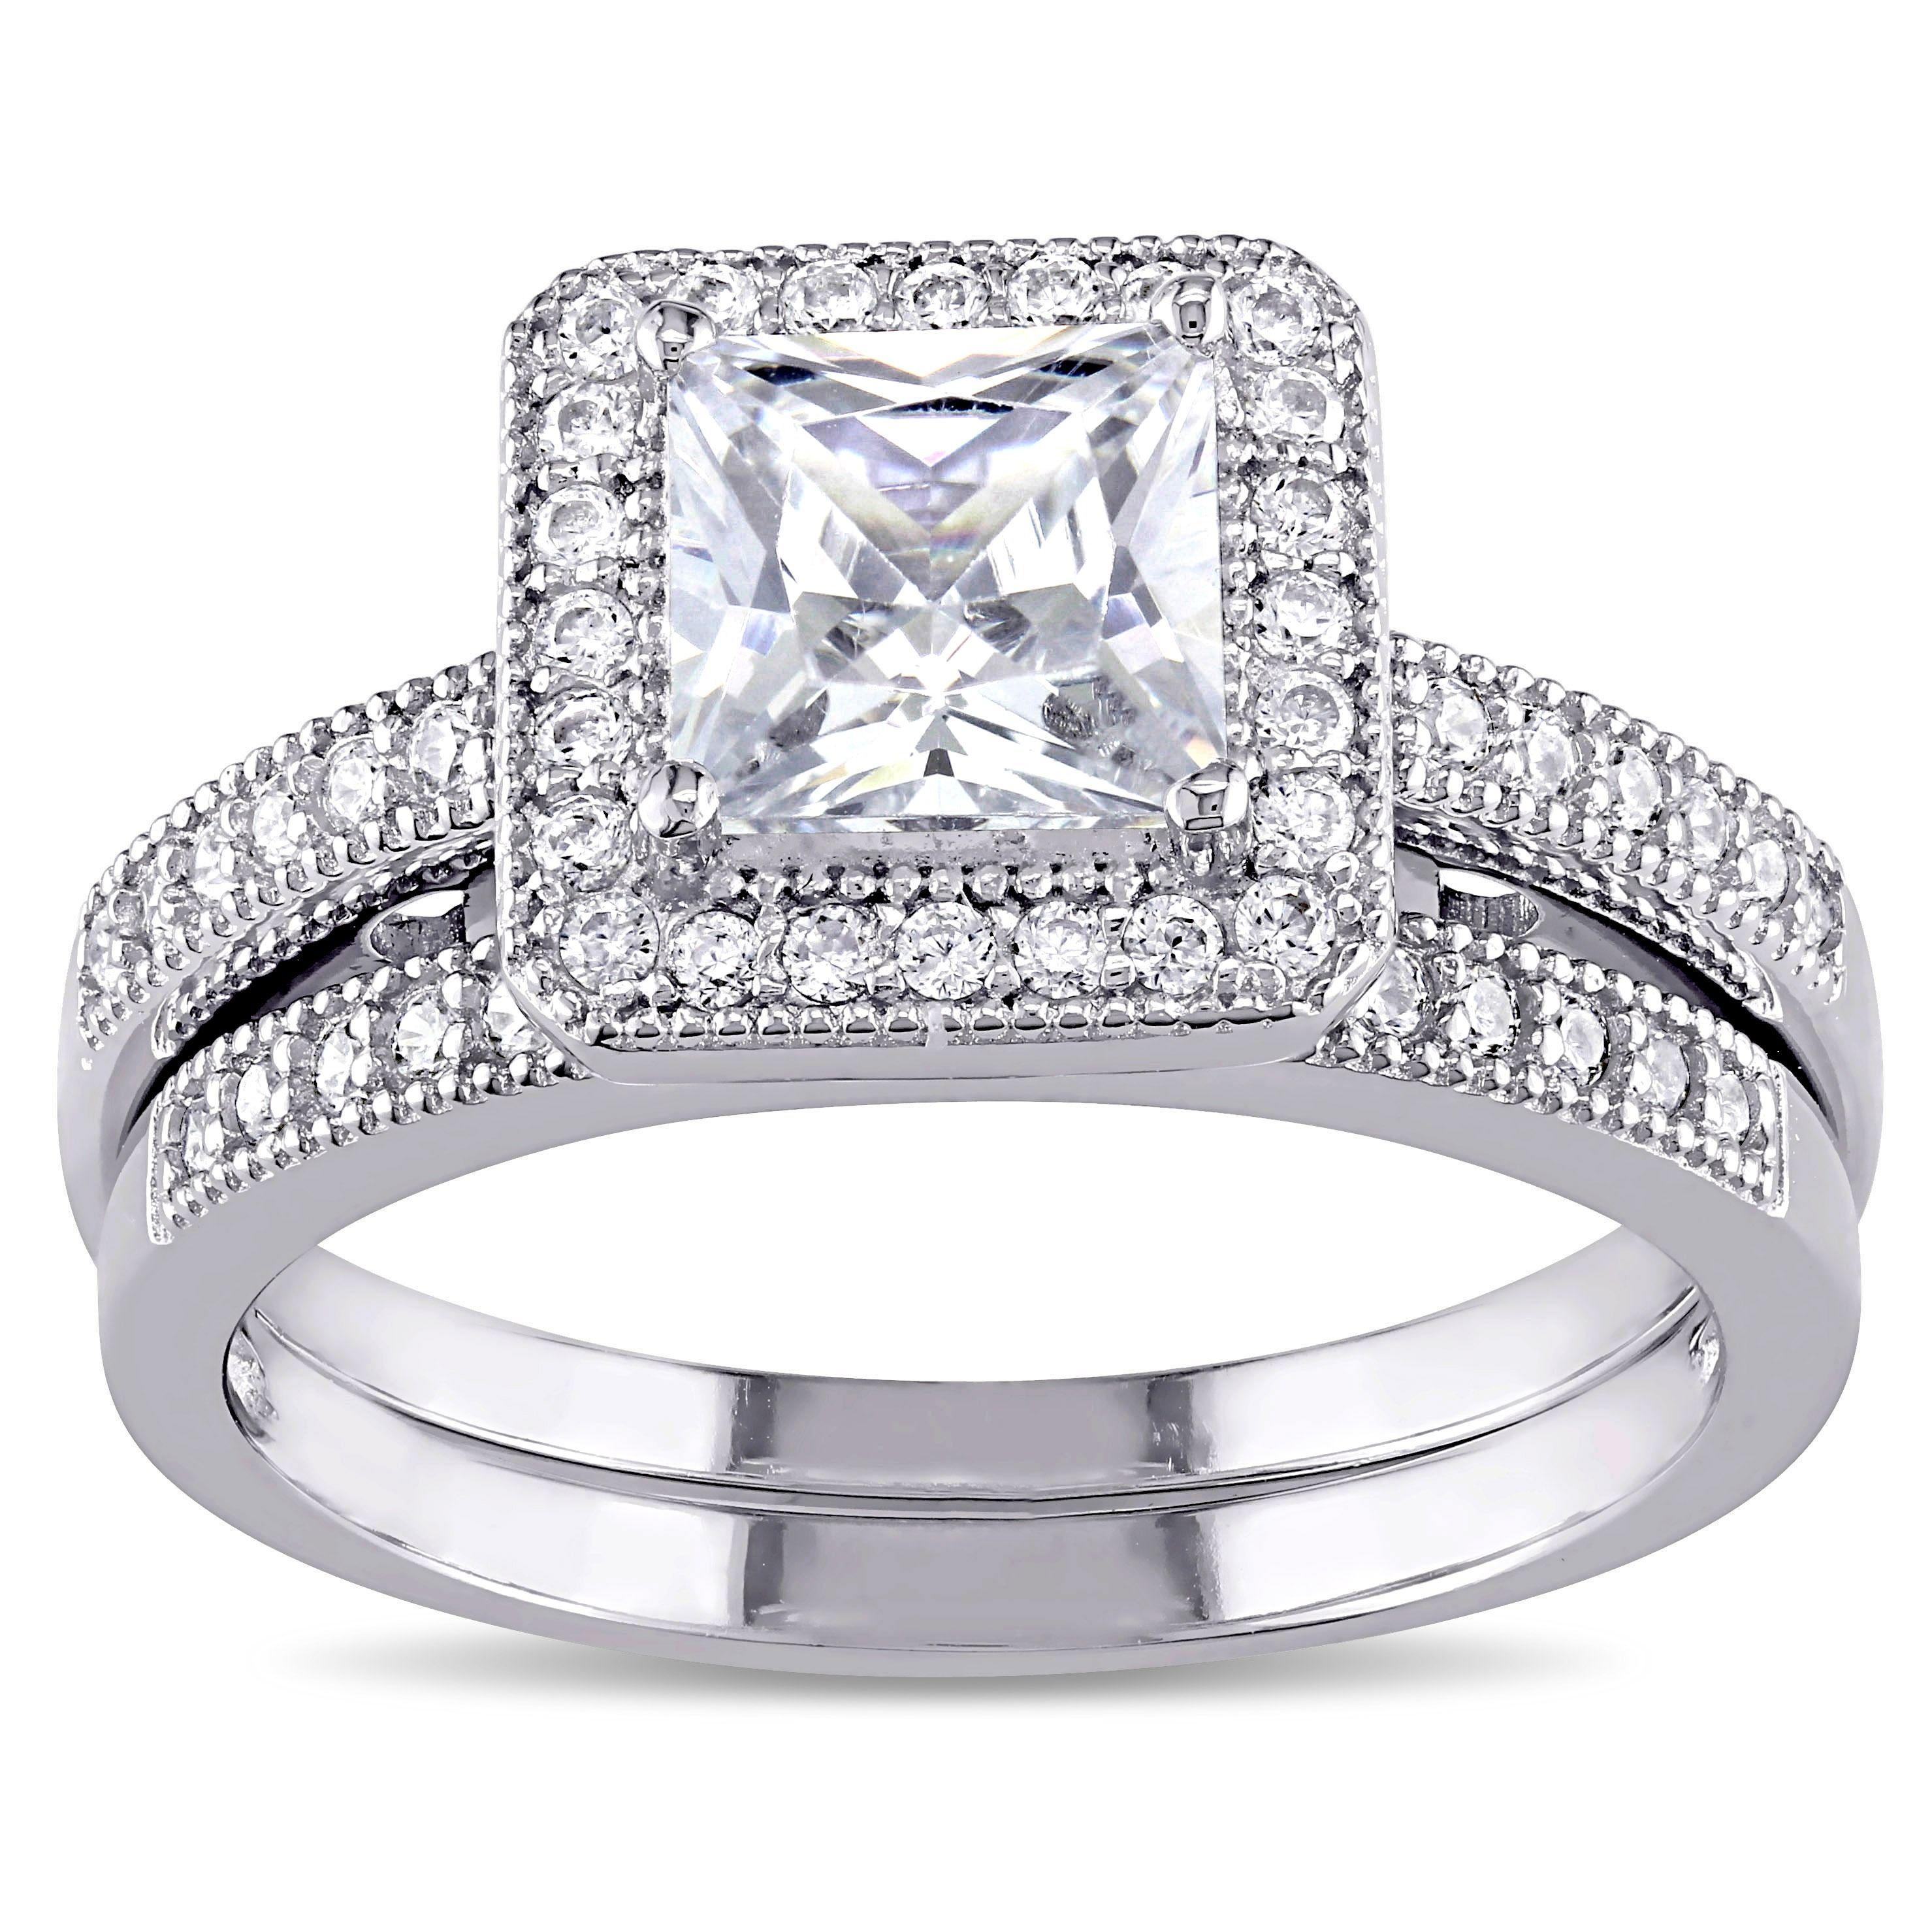 Miadora Sterling Silver White Cubic Zirconia Bridal Ring Set Size 10 Women S